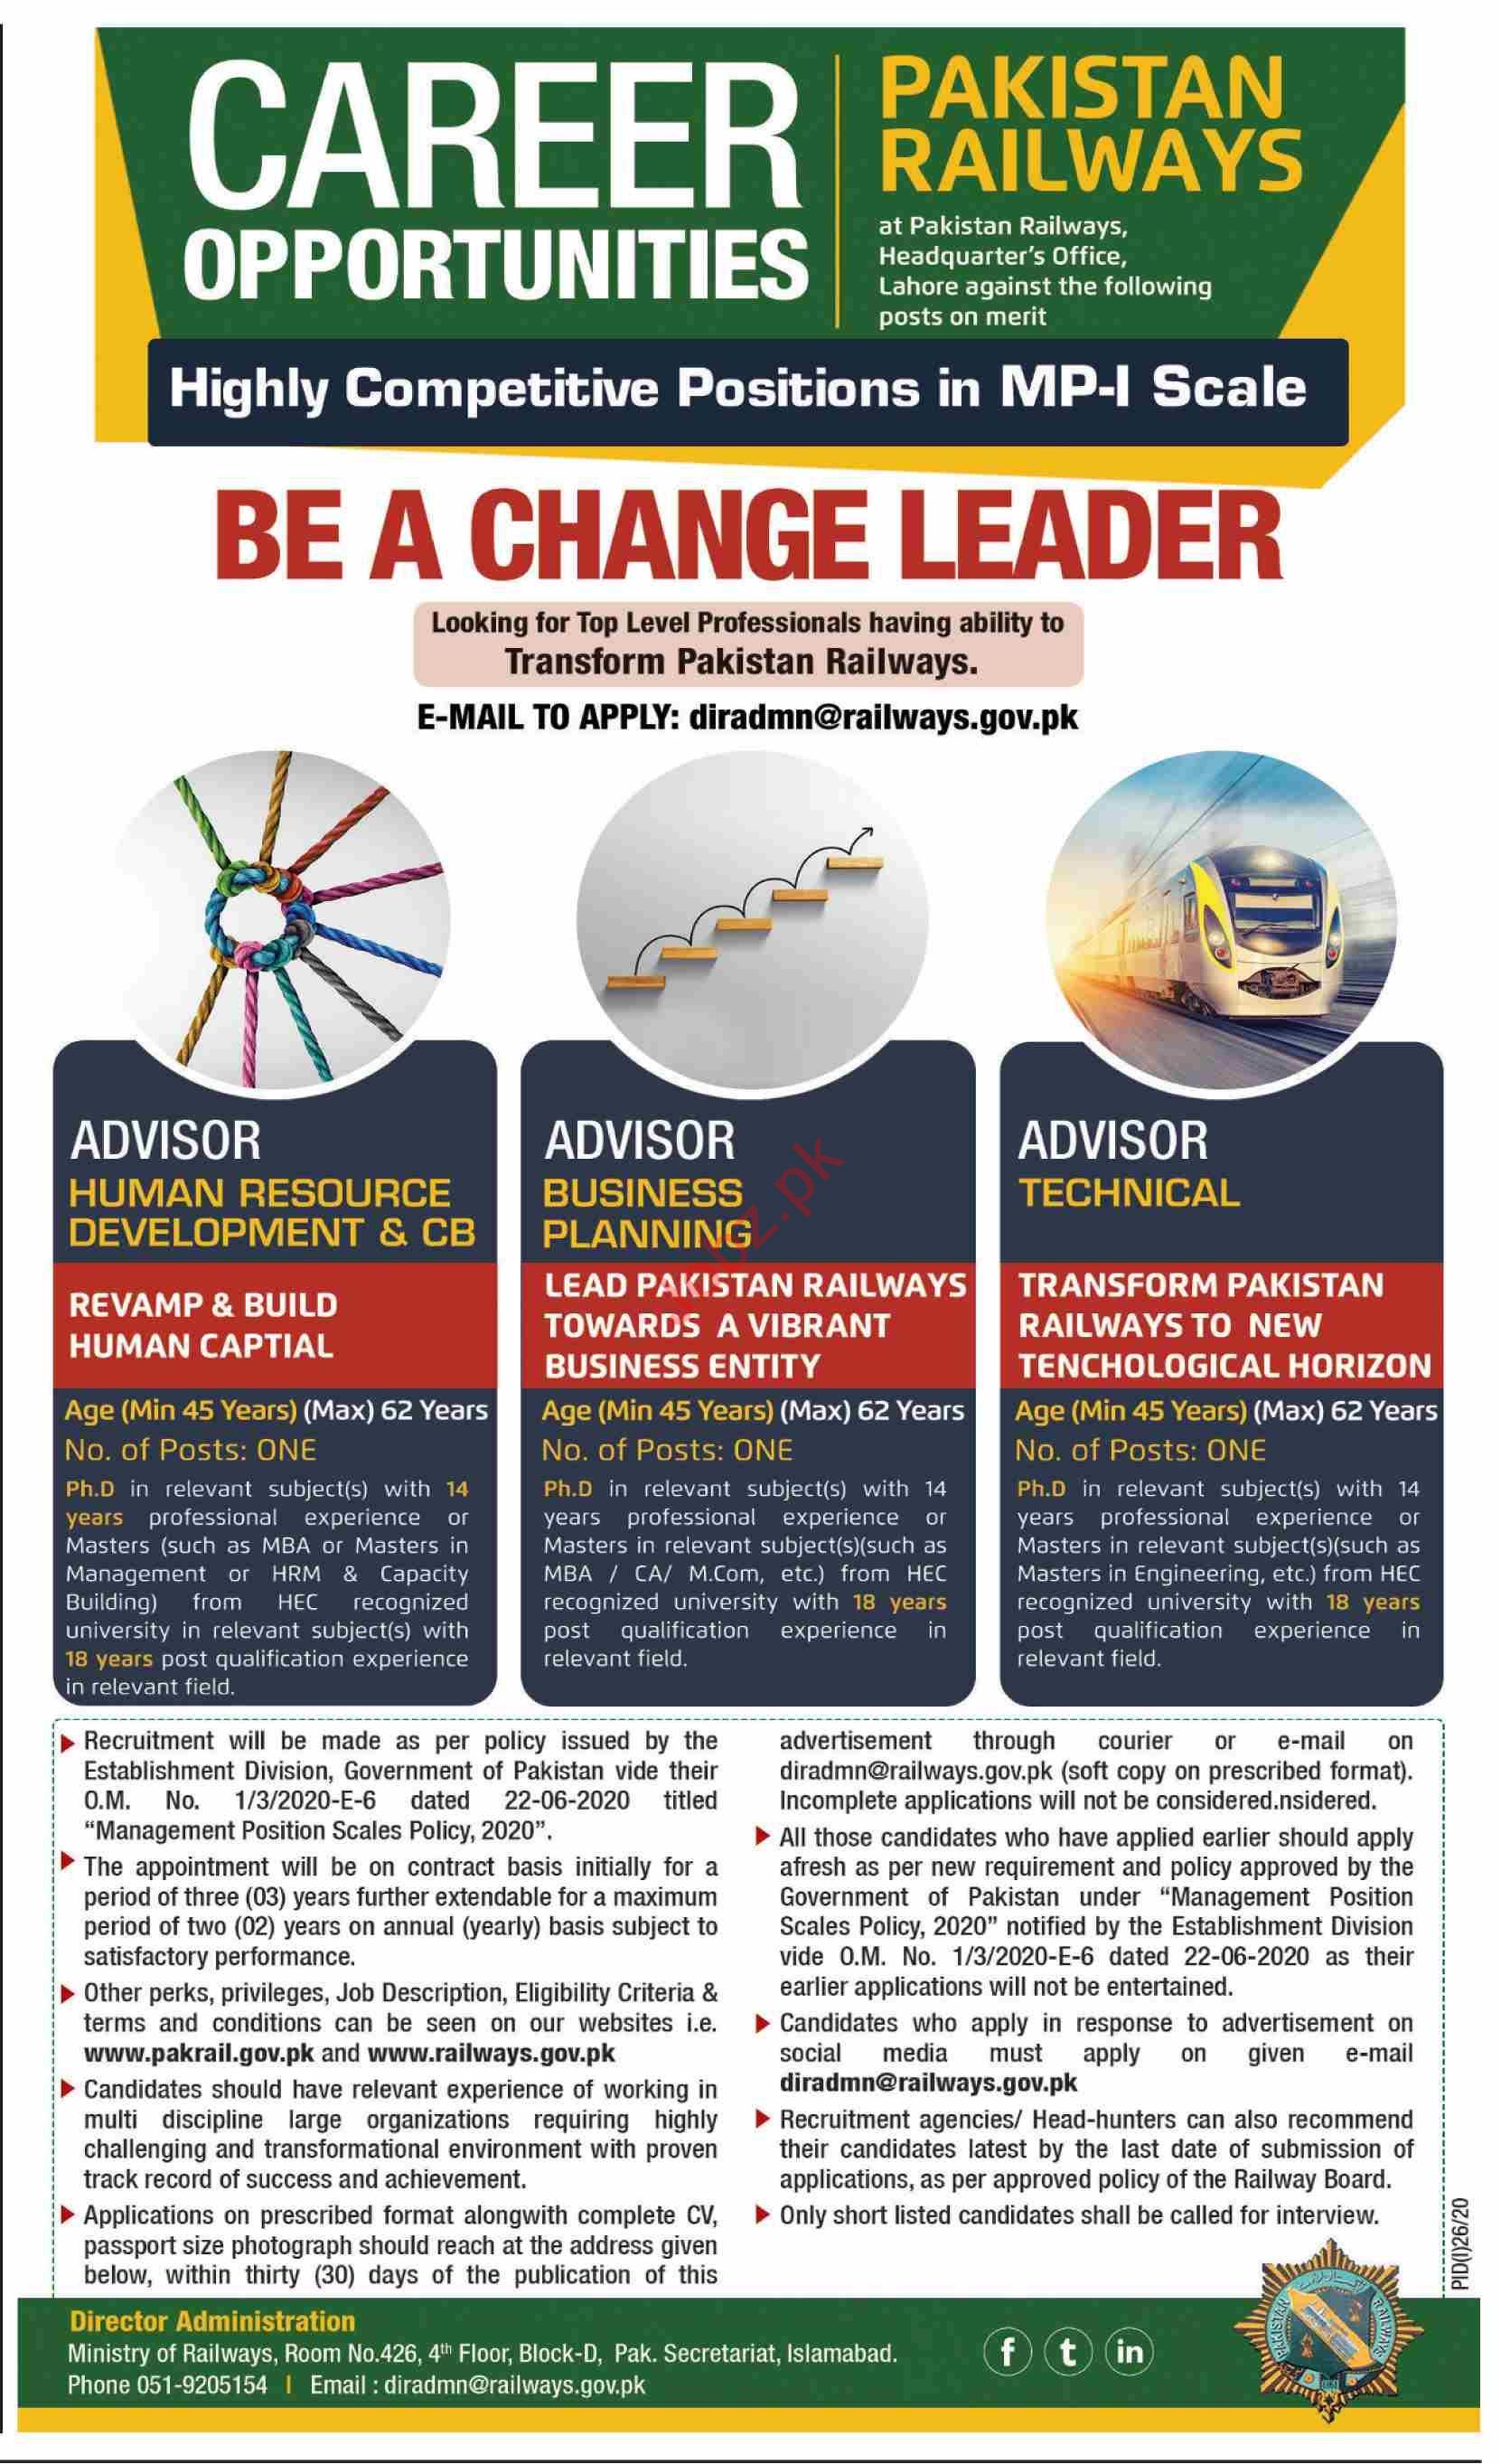 Pakistan Railways Jobs 2020 for Advisor Business Planning